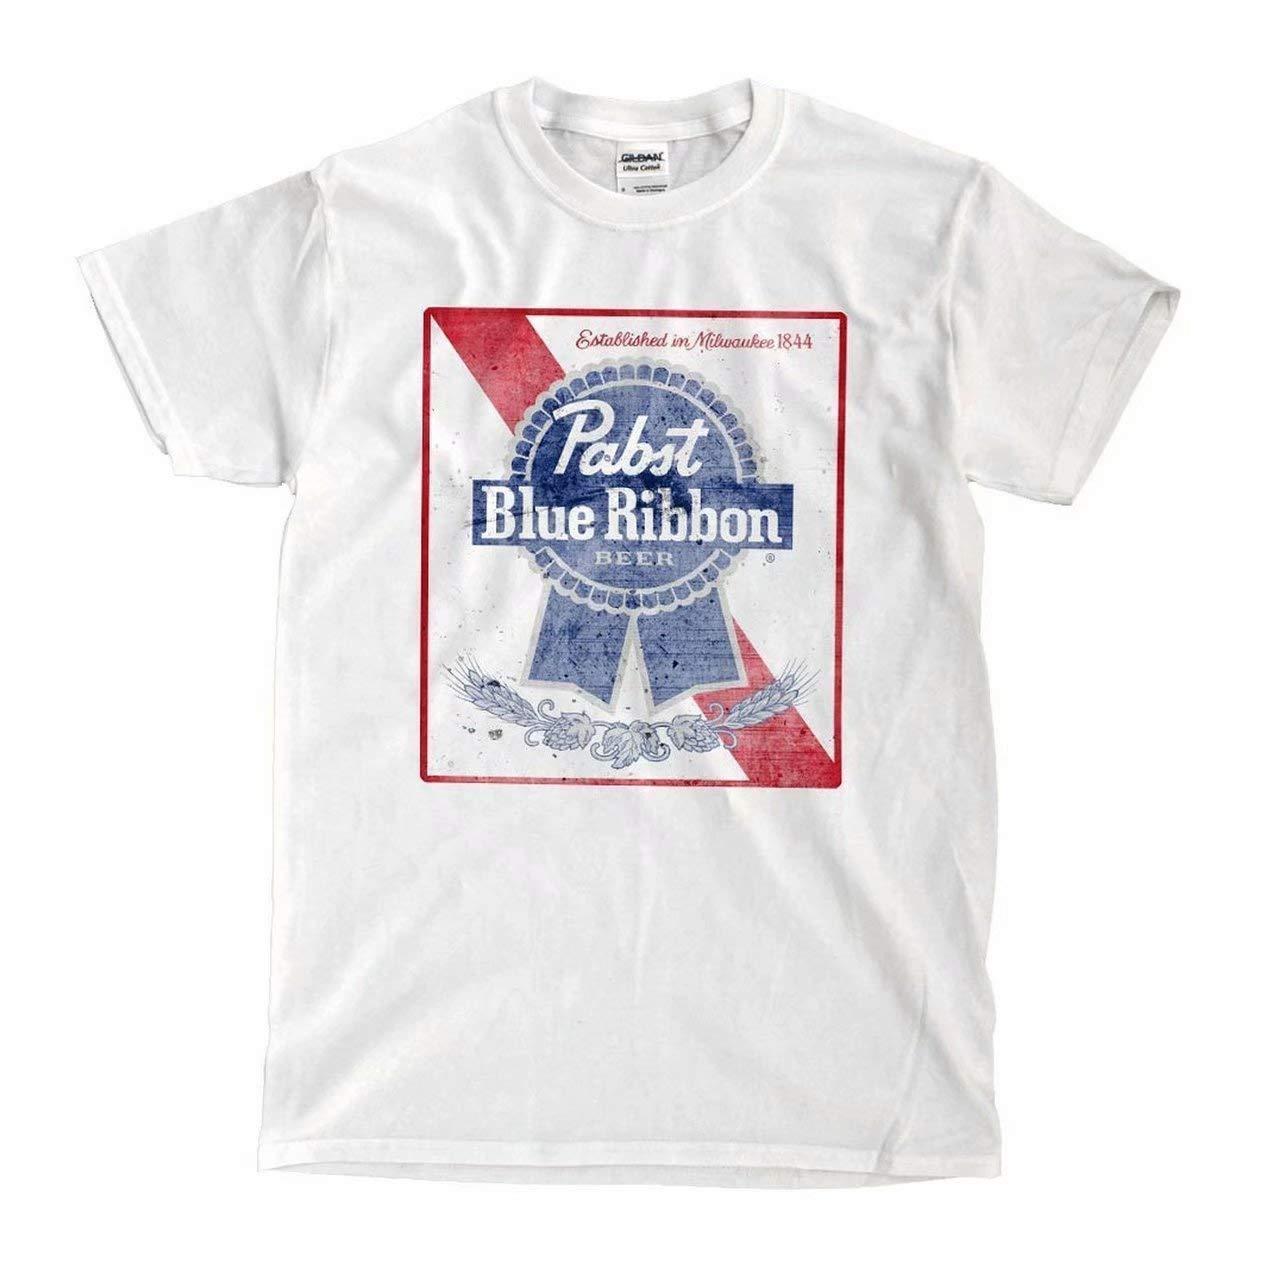 Ailise Pabst Blue Ribbon Funny 8395 Shirts